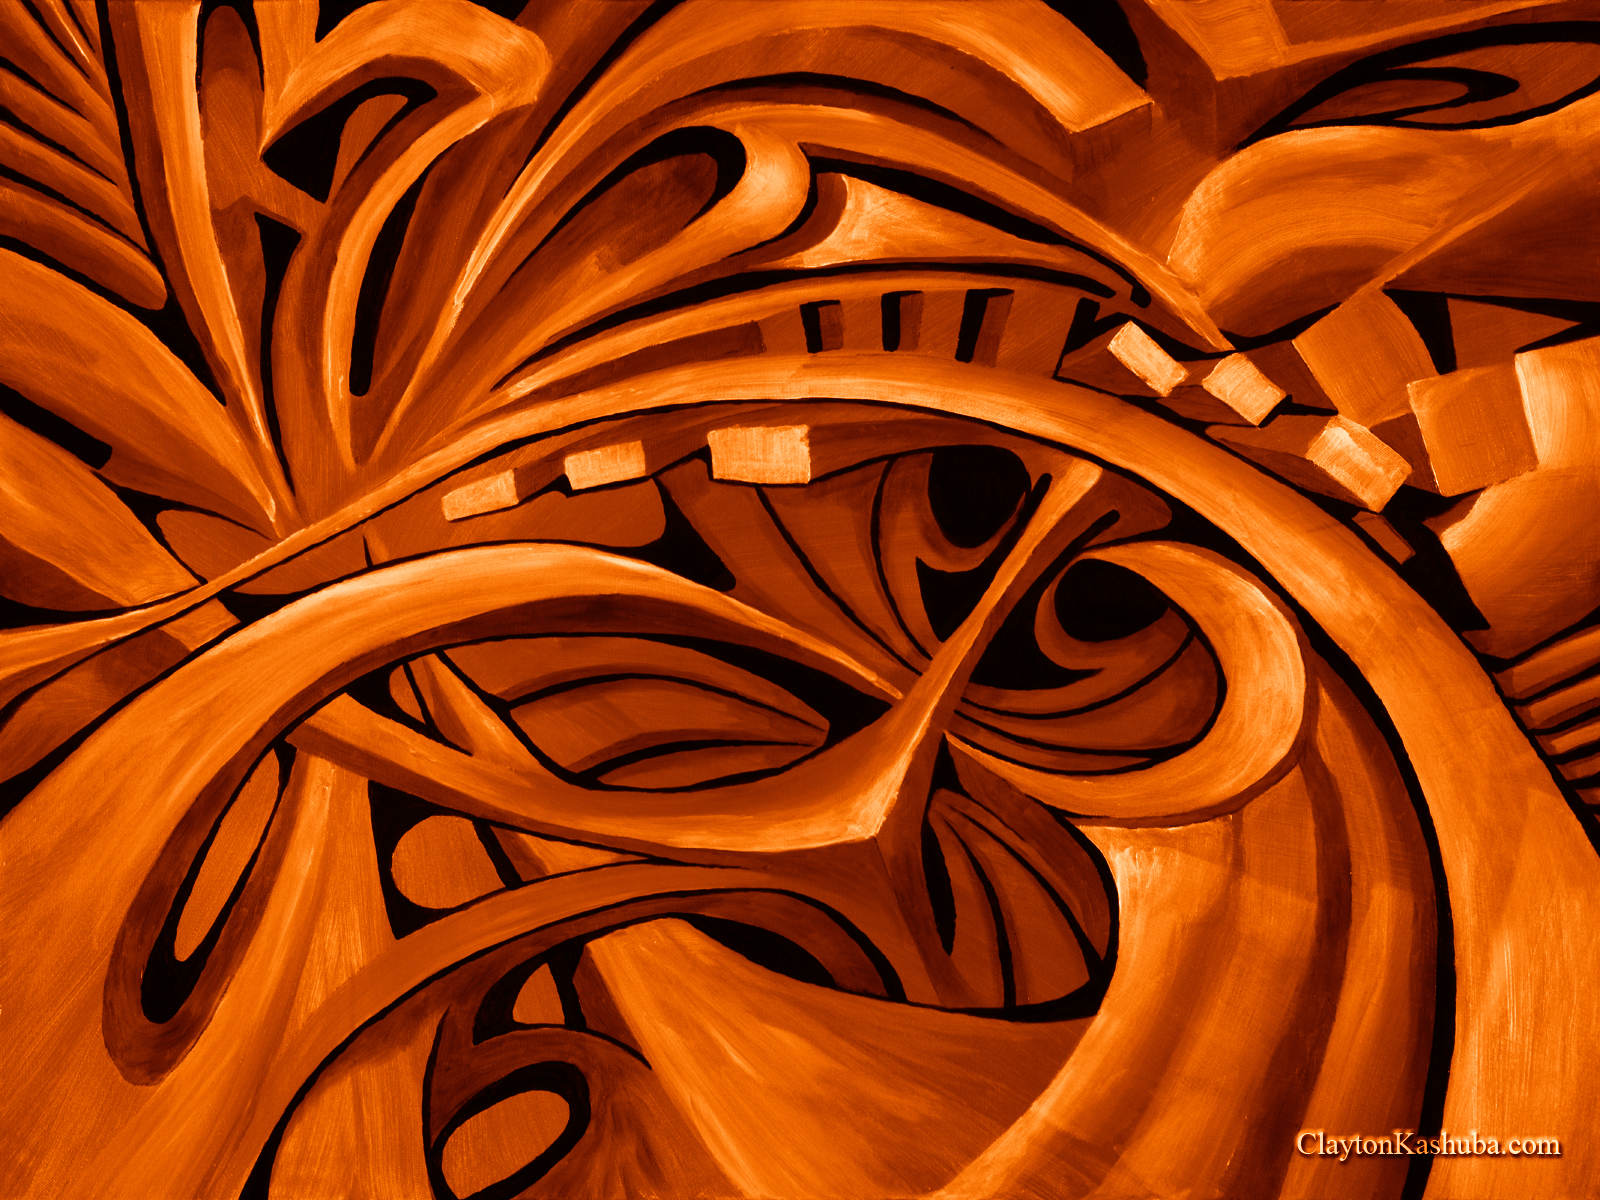 Cubist Art Wallpaper - WallpaperSafari